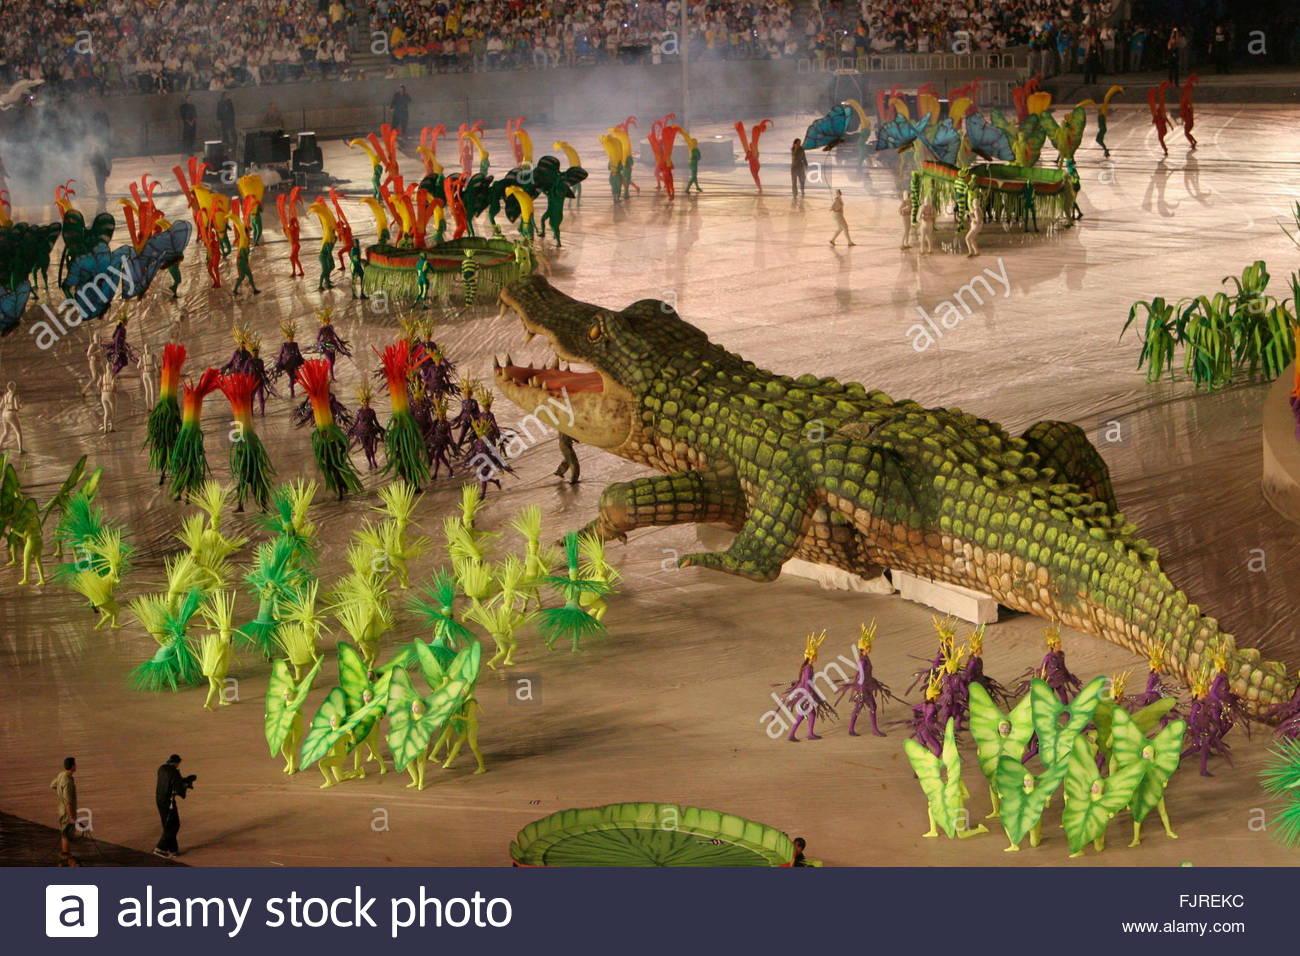 epa01065481-a-giant-crocodile-puppet-wal